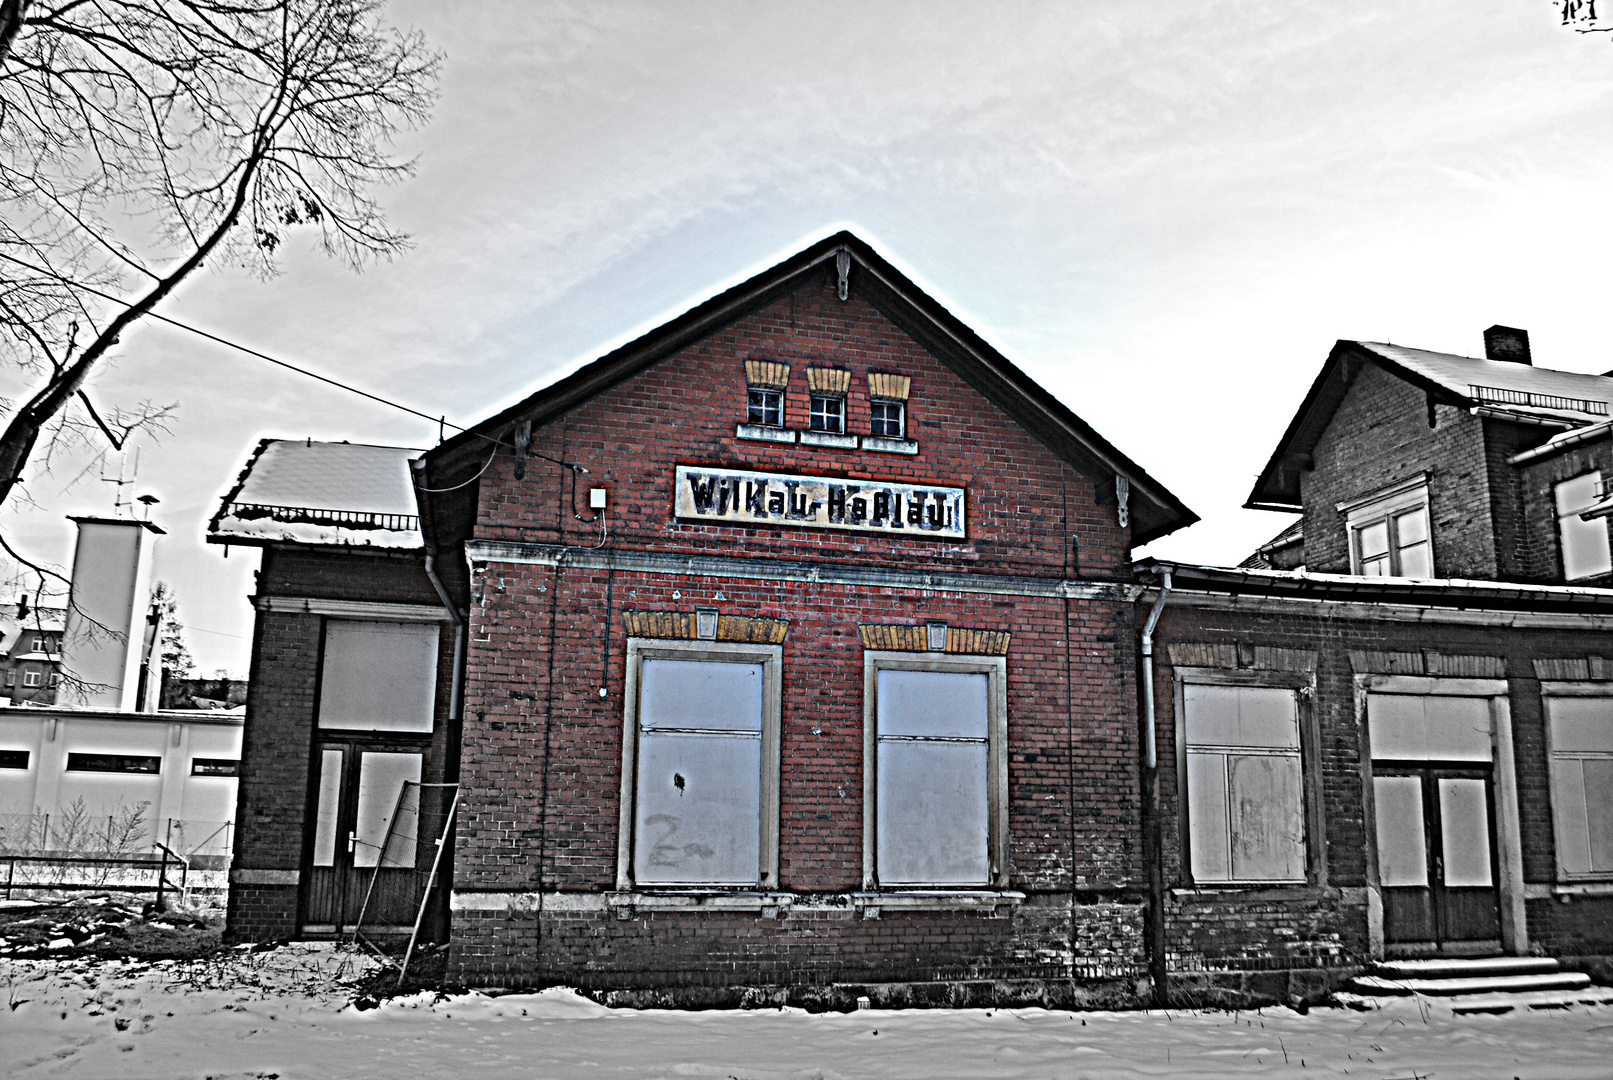 Bahnhof Wilkau-Haßlau